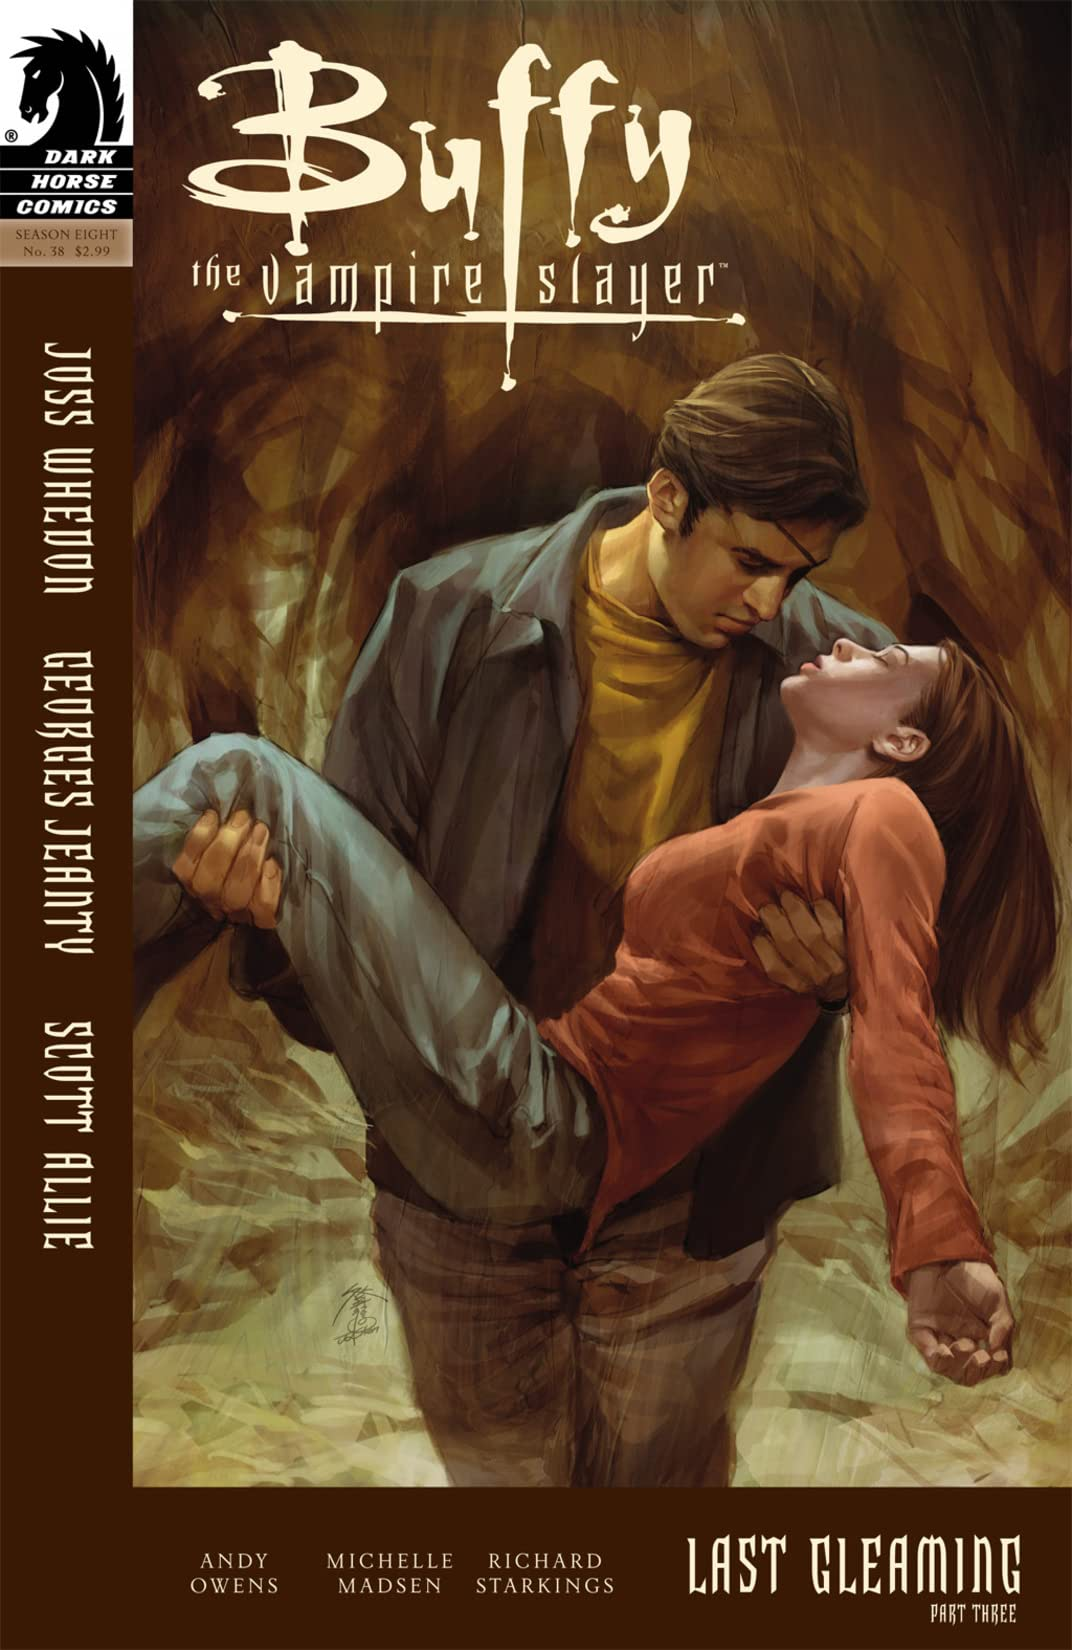 Buffy the Vampire Slayer: Season 8 #38